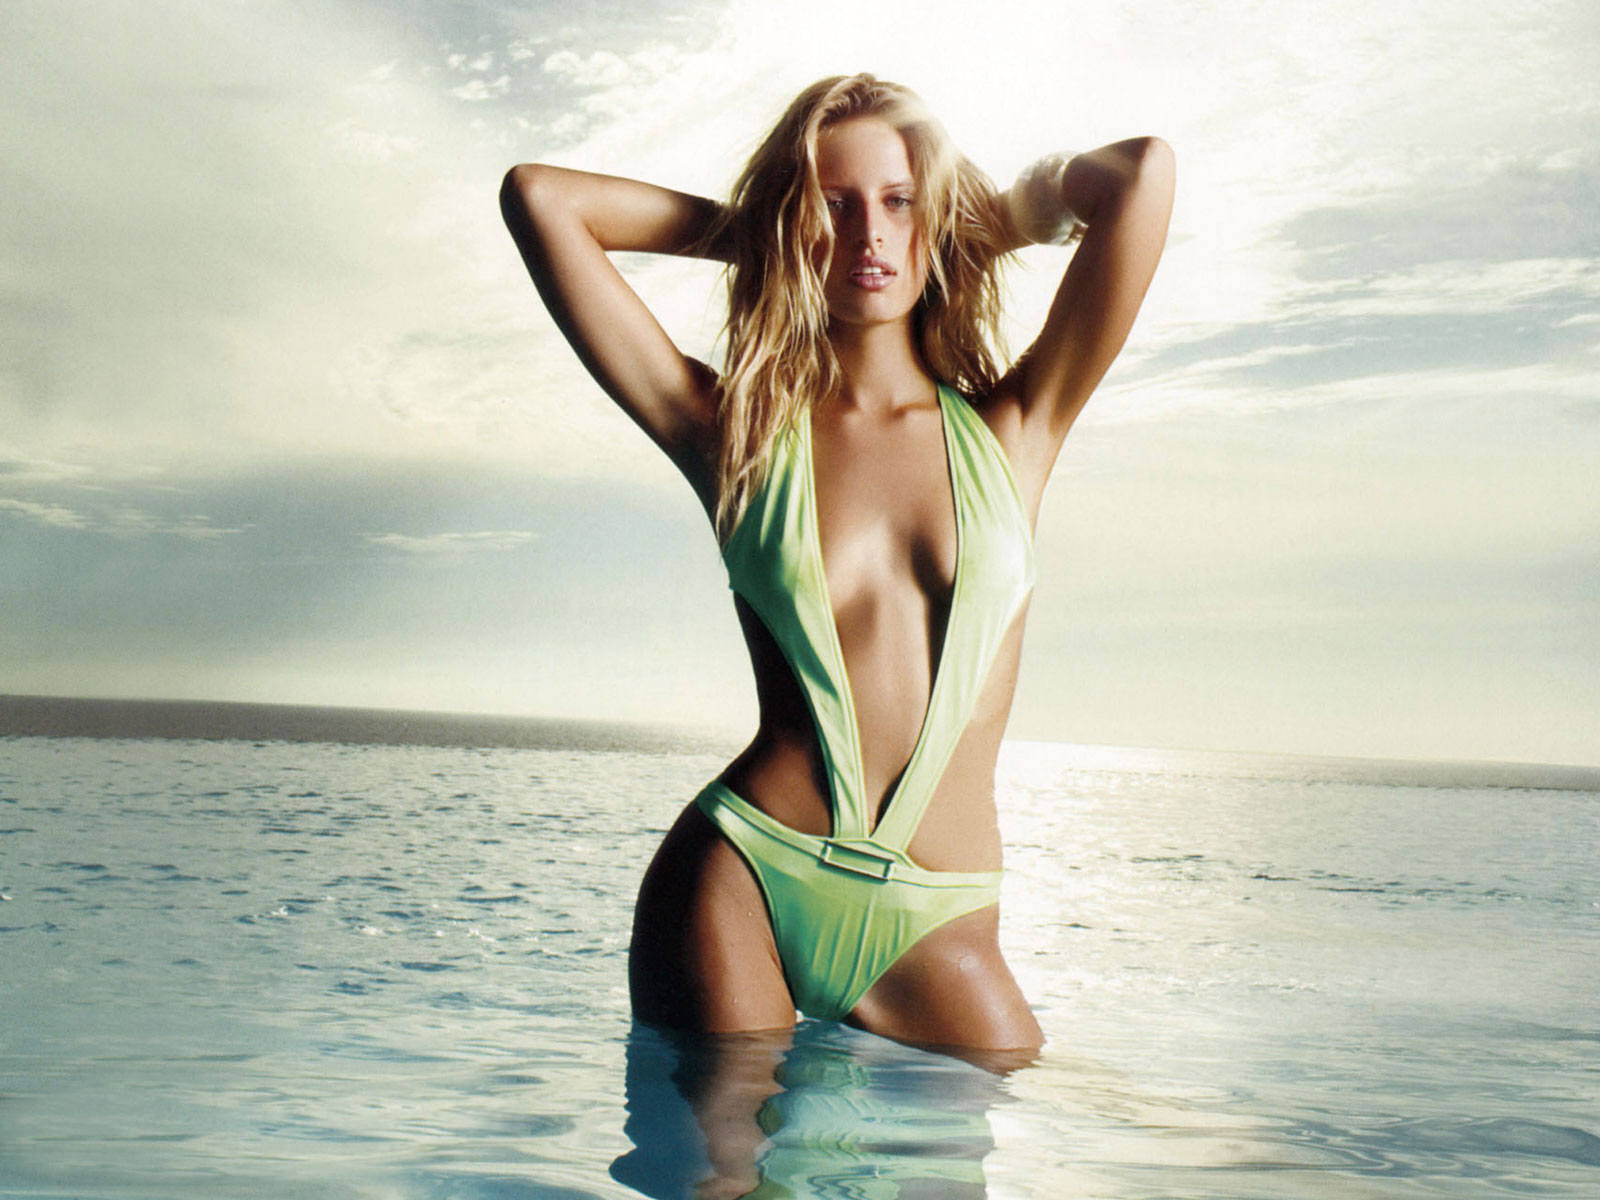 karolina kurkova hot class=cosplayers